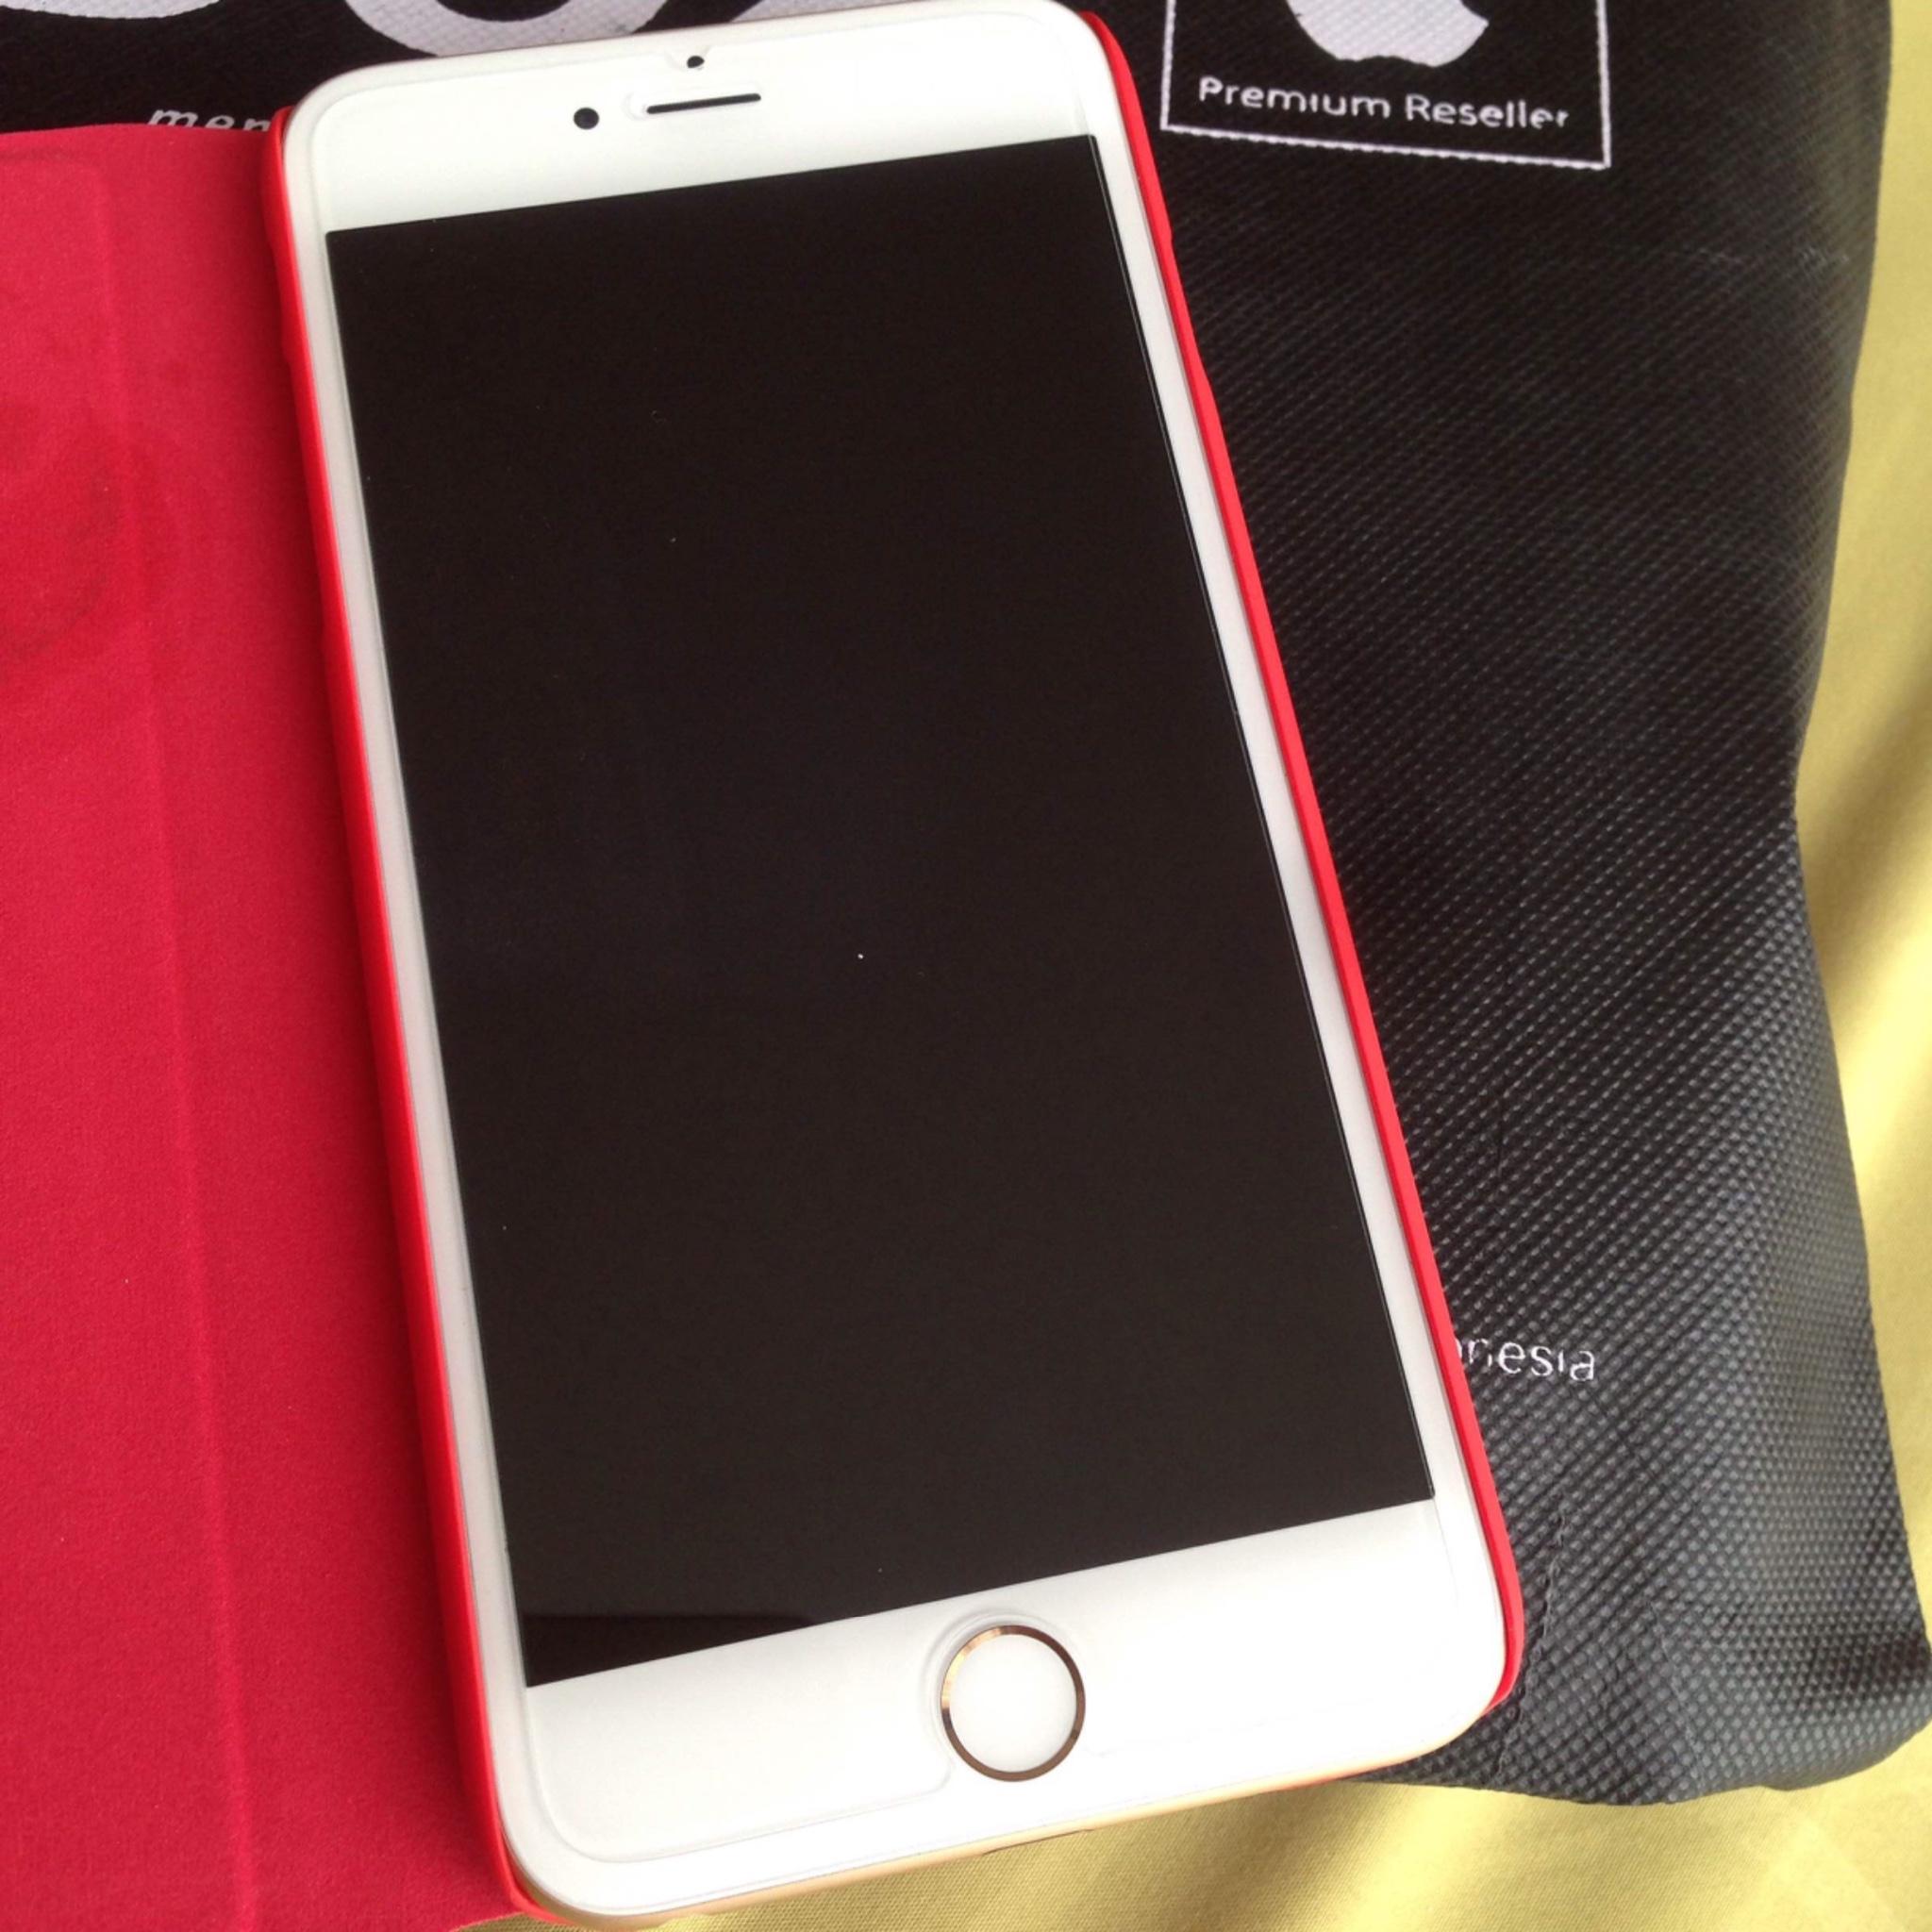 Jual Iphone 6 Plus 16gb Gold Beli Di Ibox Plaza Indonesia